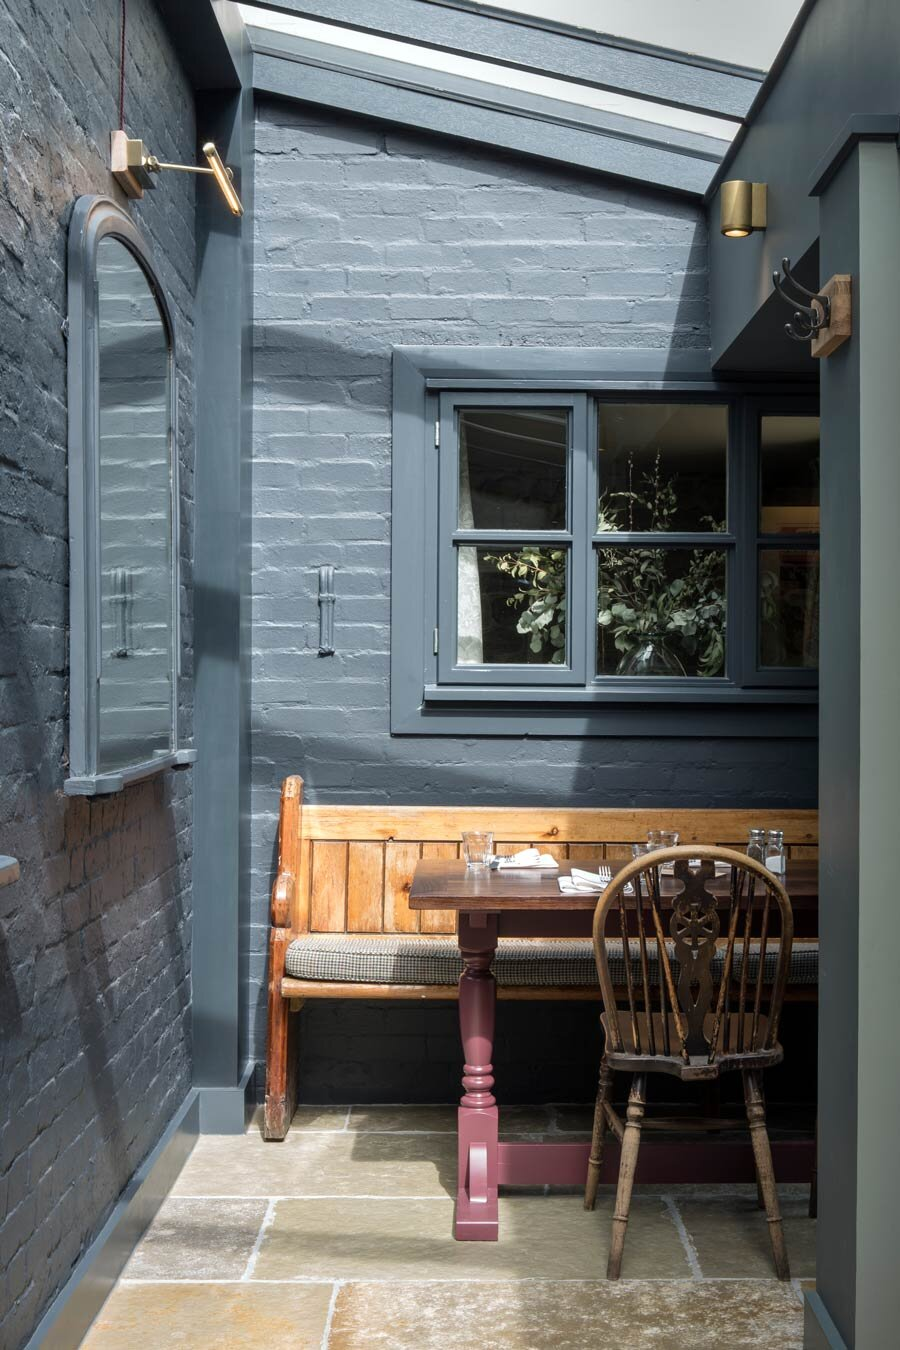 rogue designs oxford  perch inn PERCH_DINING_ROOM-0947.jpg